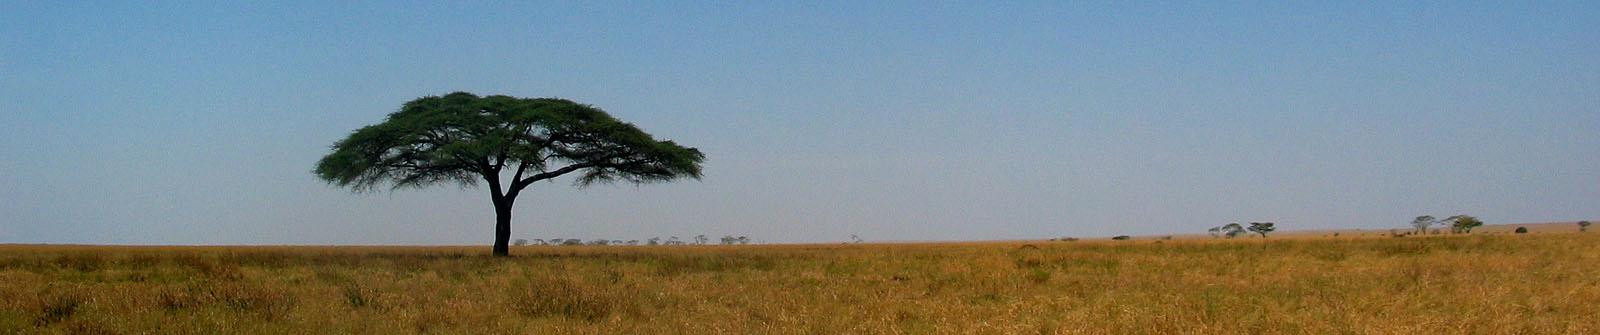 serengeti.jpg